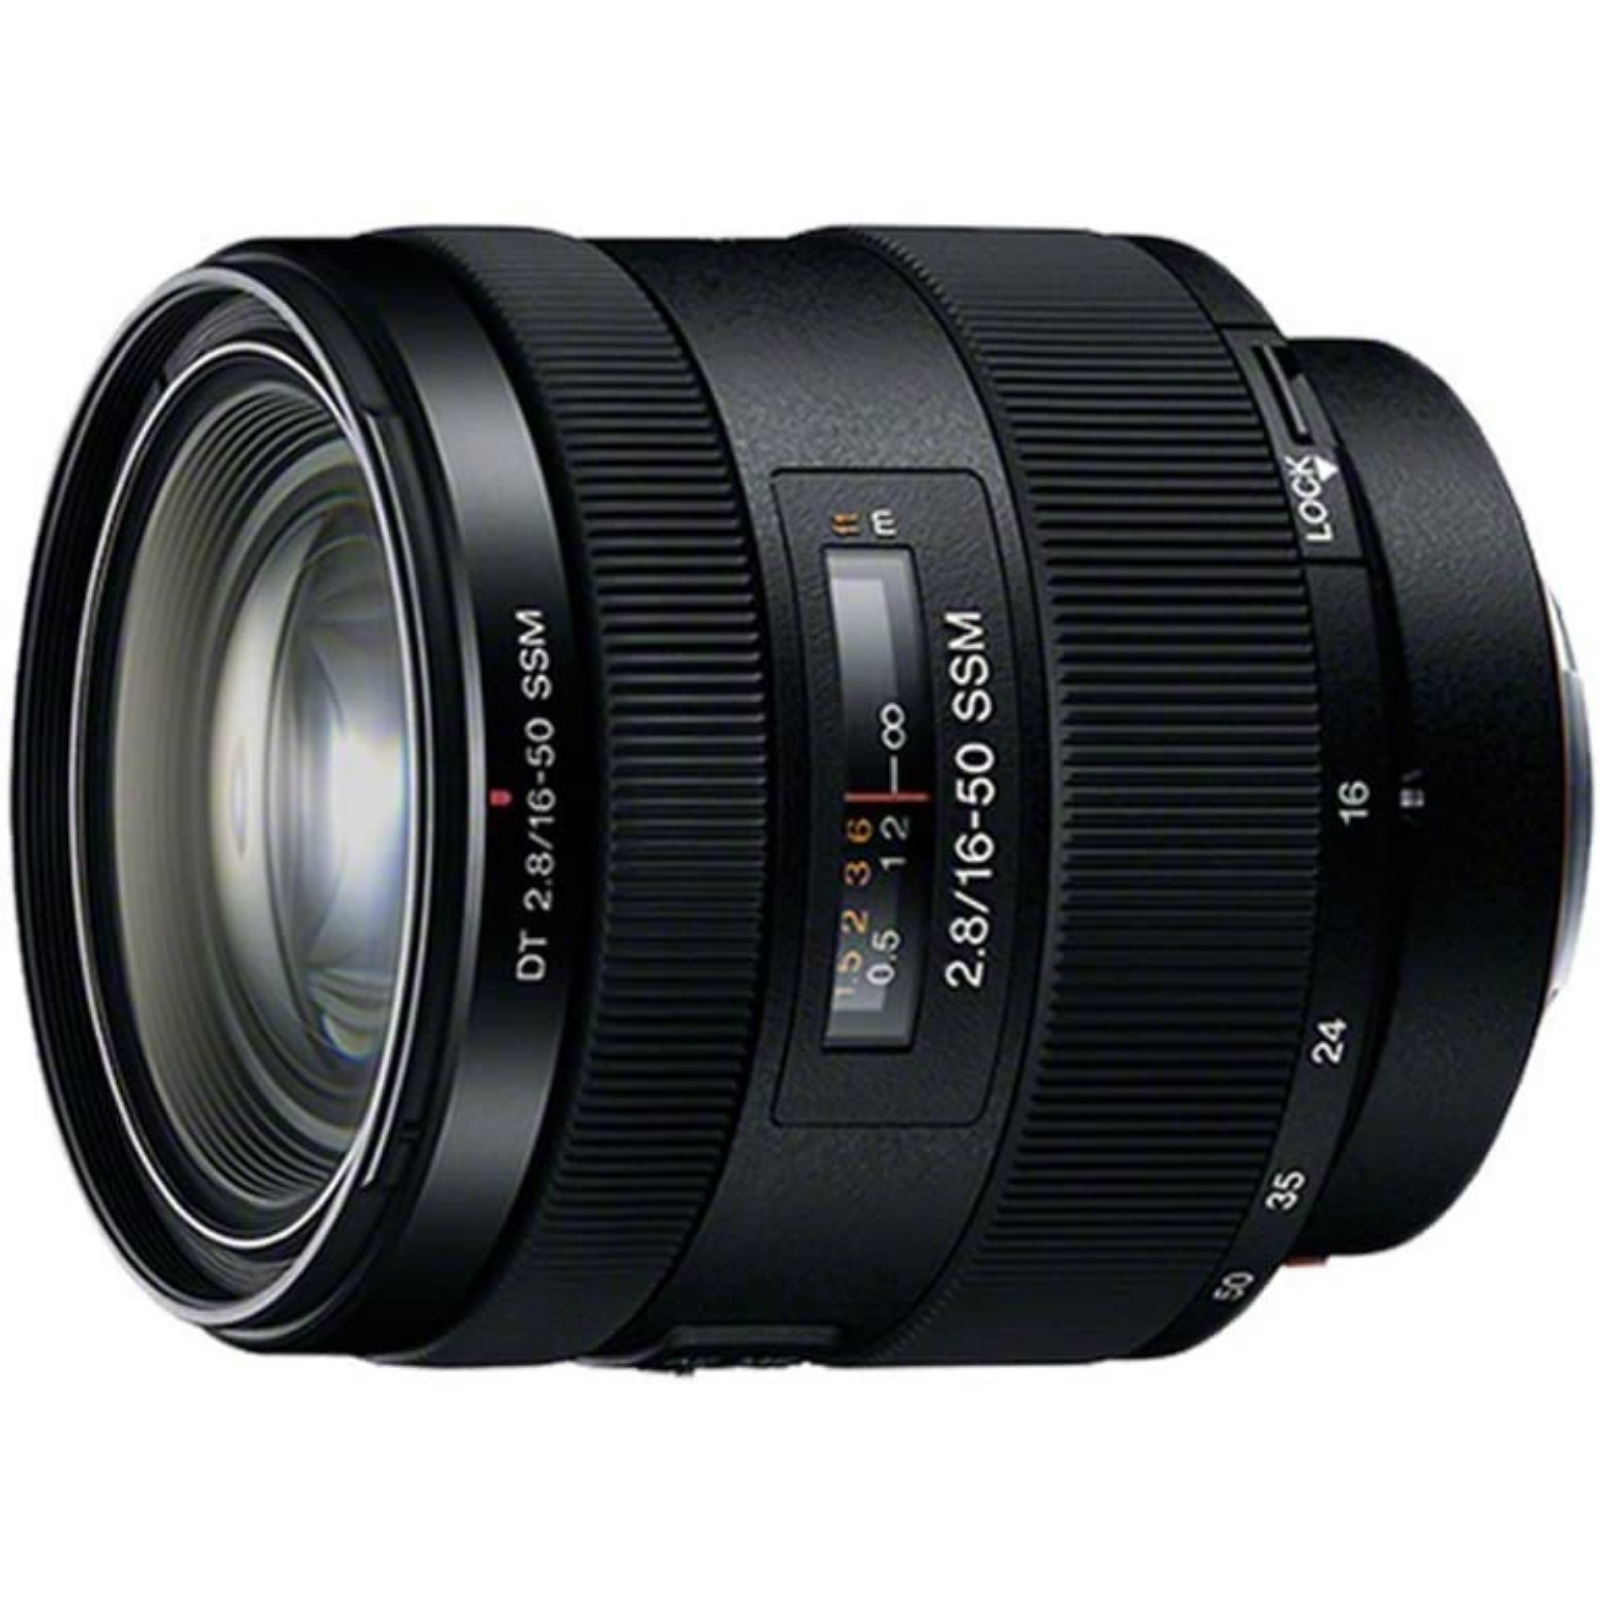 SONY ソニー 標準ズームレンズ DT 16-50mm F2.8 SSM ブラック SAL1650 新品 (簡易箱)